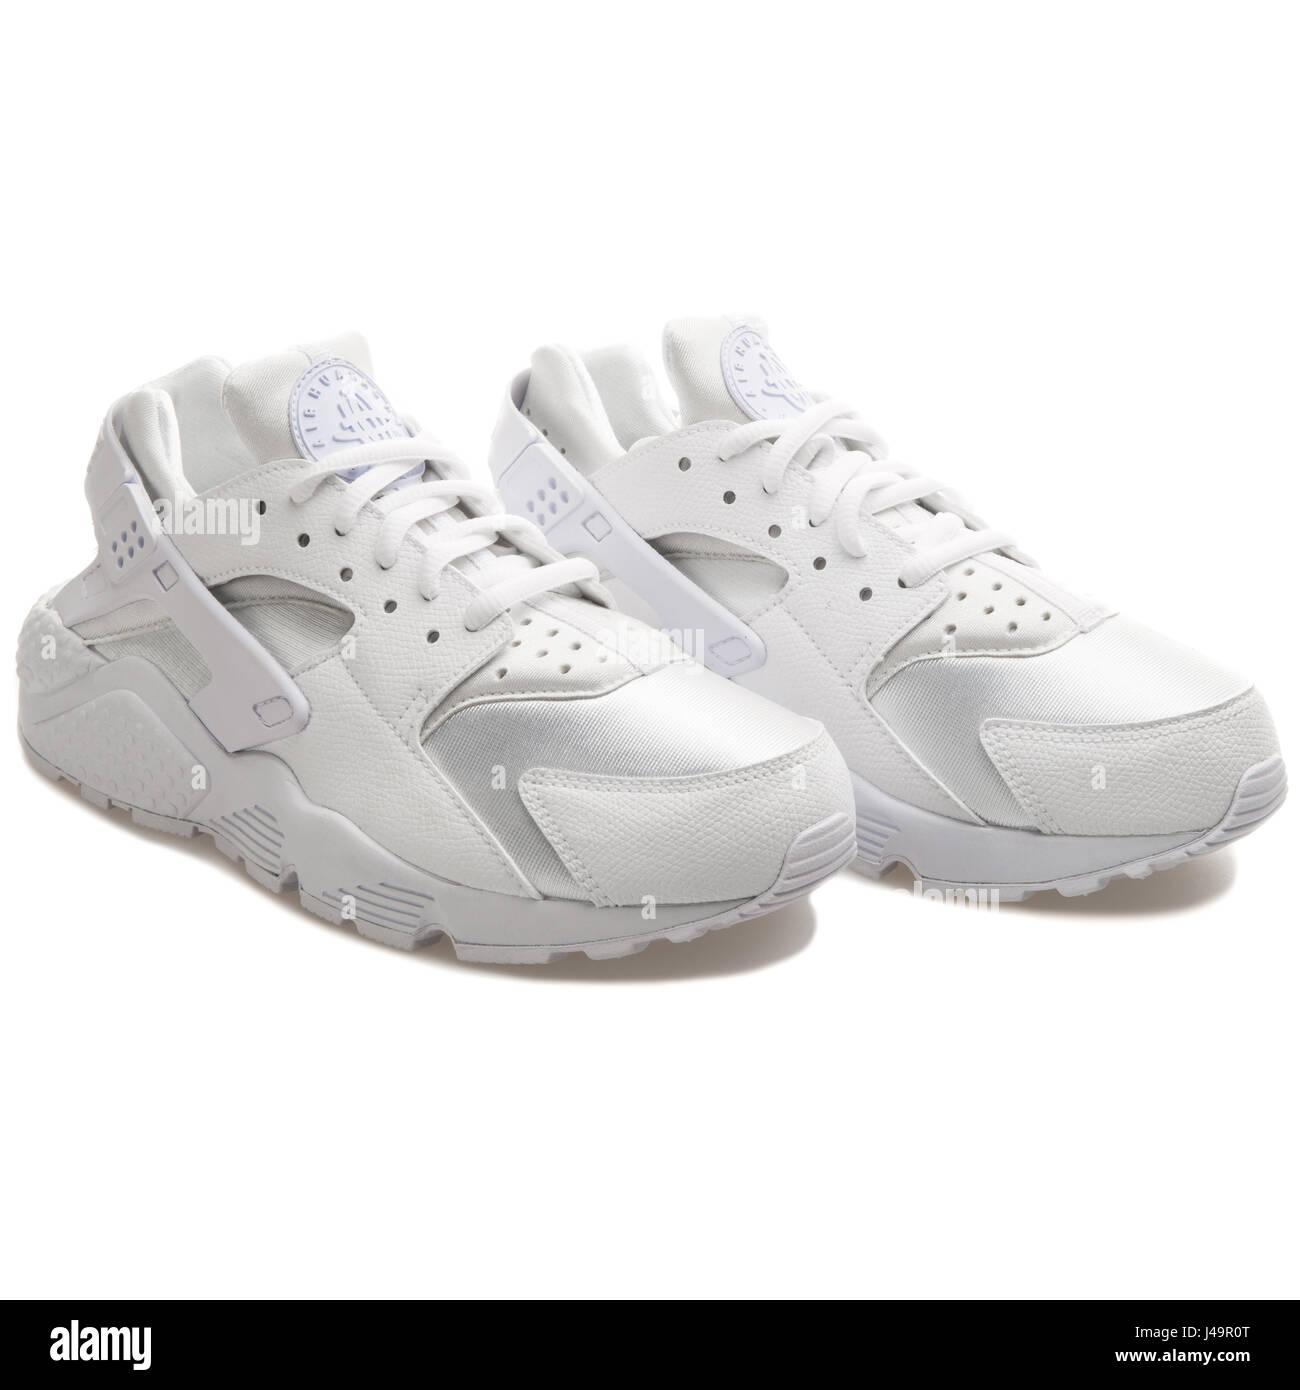 official photos b999e 332c4 Nike WMNS Air Huarache Run White - 634835-106 - Stock Image